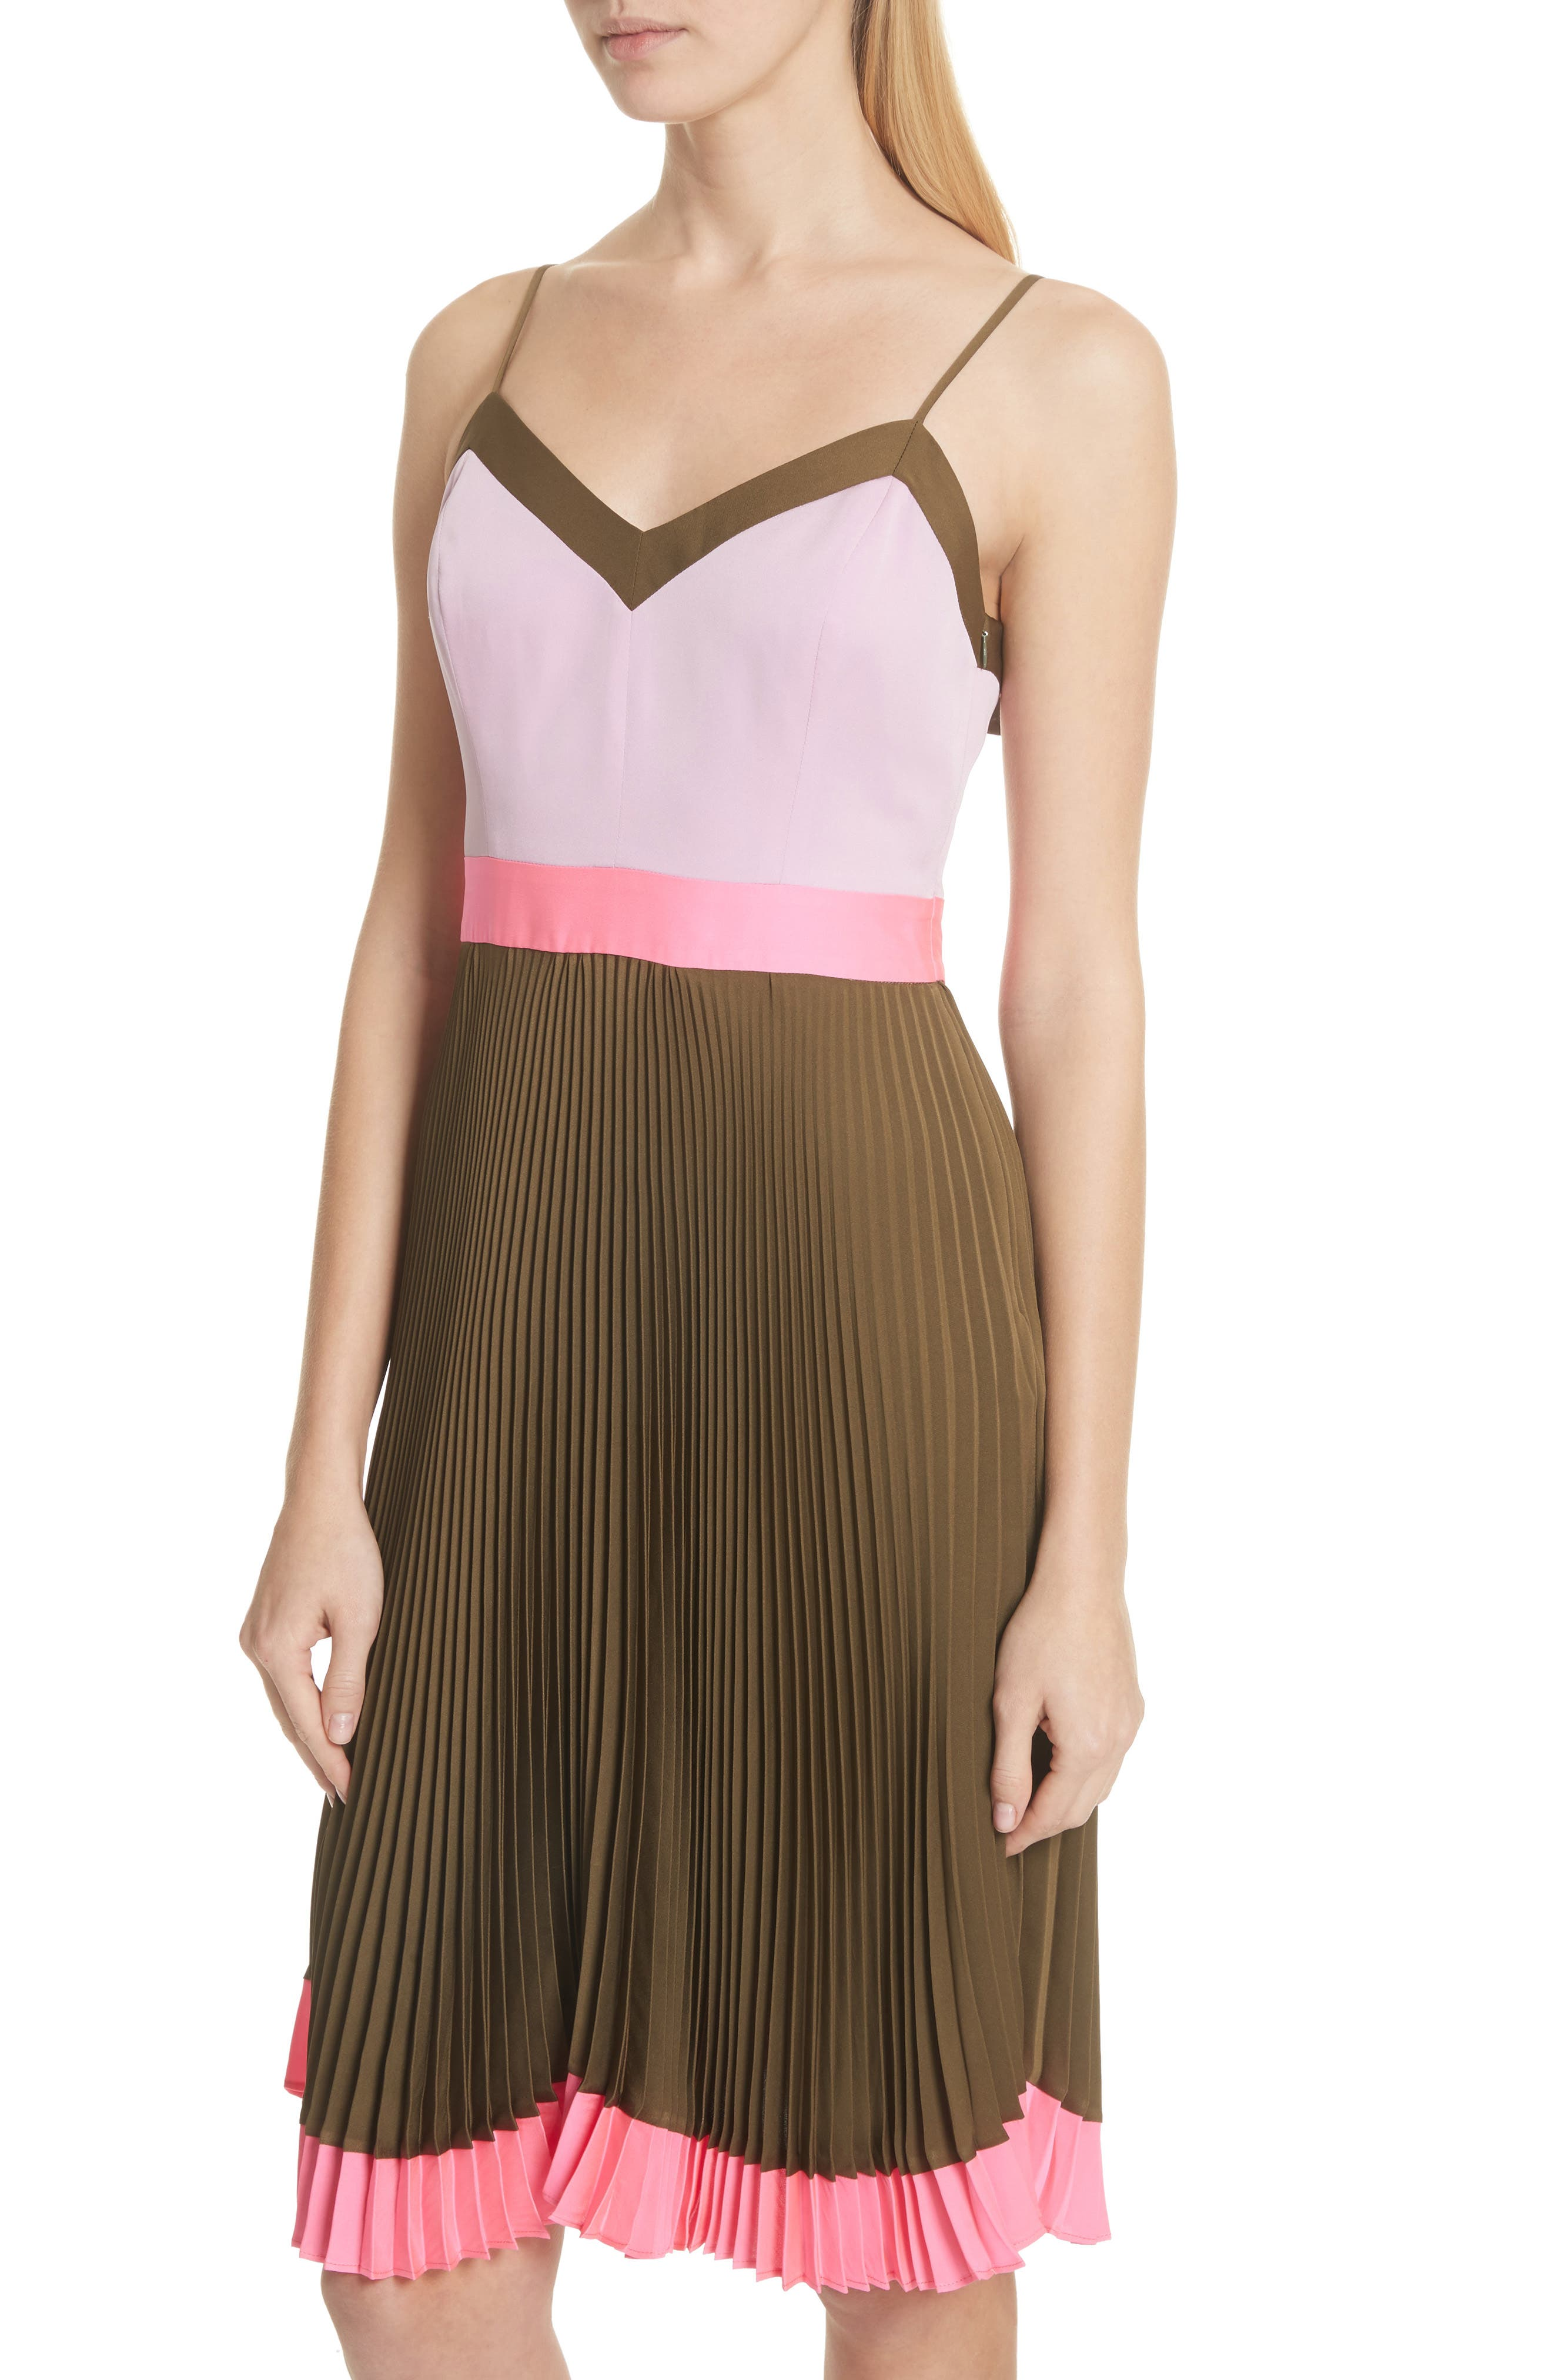 Jill Pleated Stretch Silk Dress,                             Alternate thumbnail 4, color,                             Olive/ Petal/ Fluo Pink